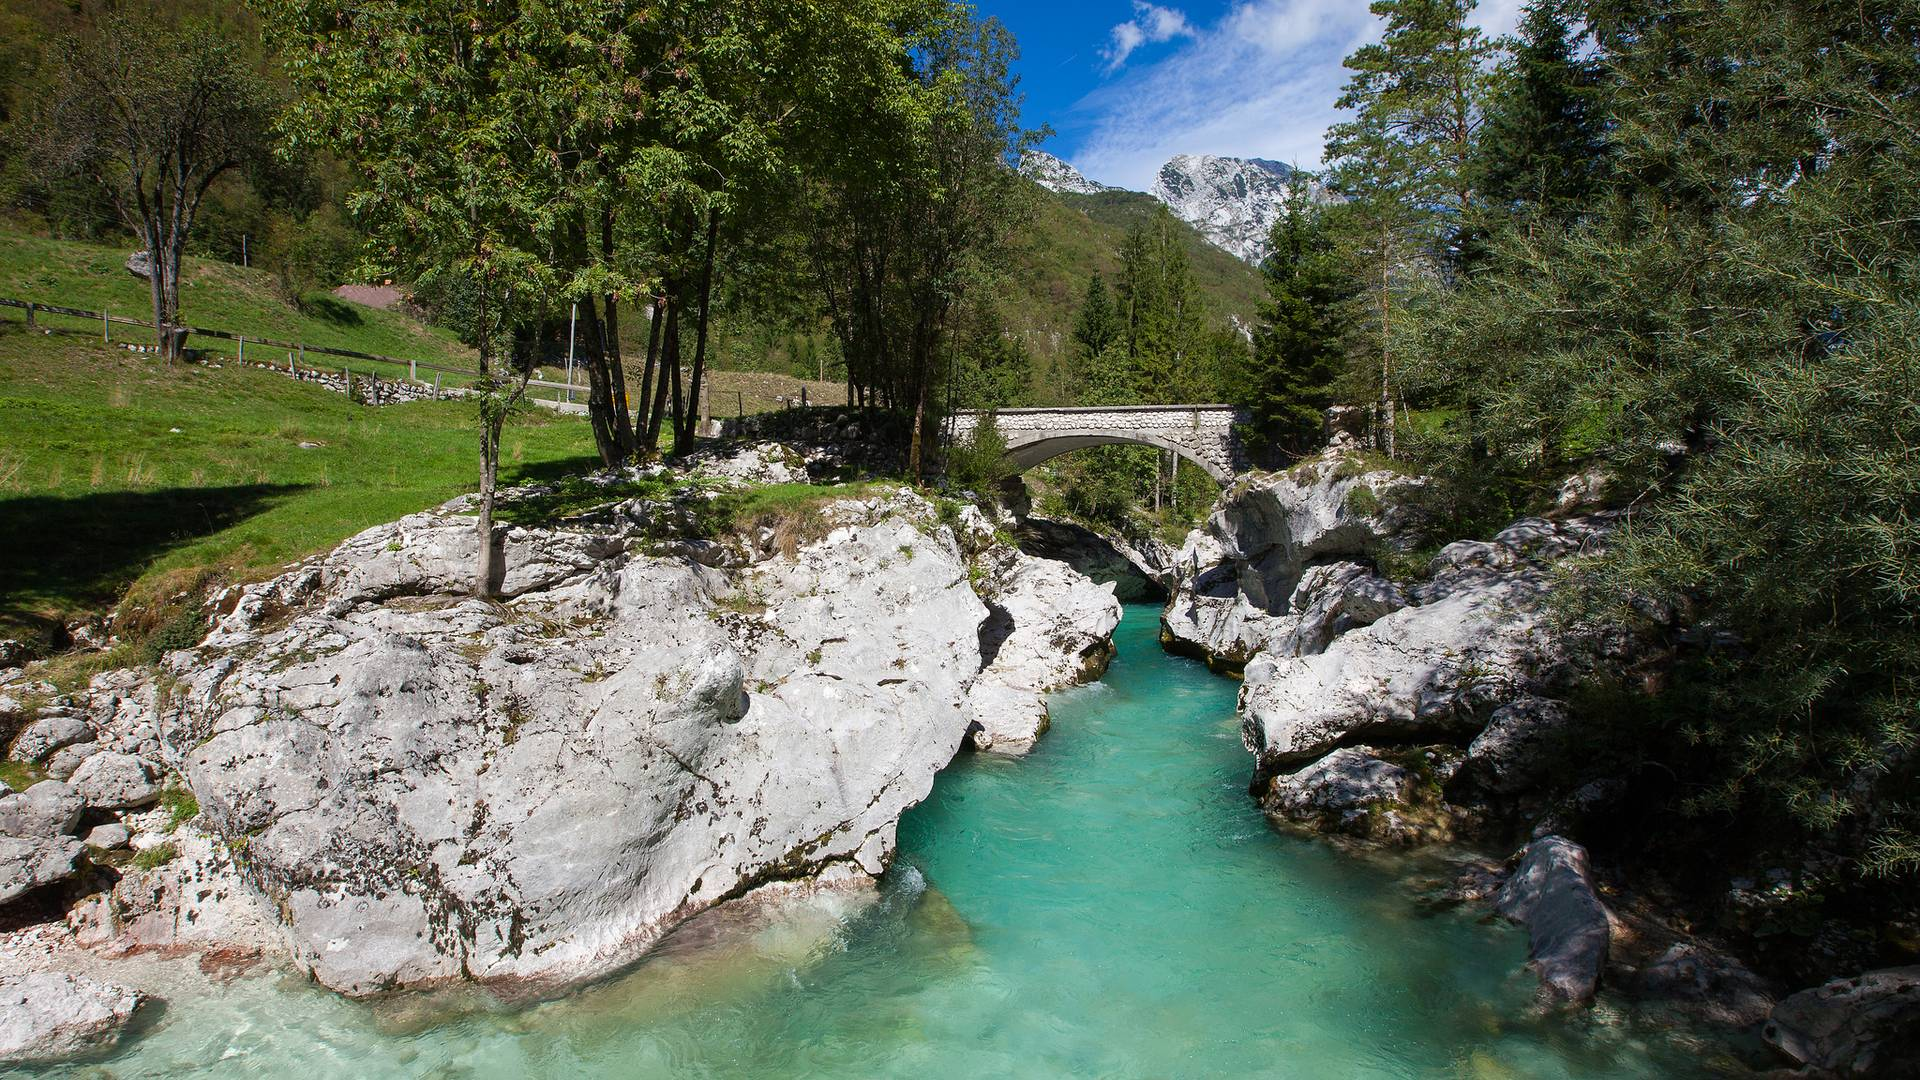 Alpe adria trail socatal web